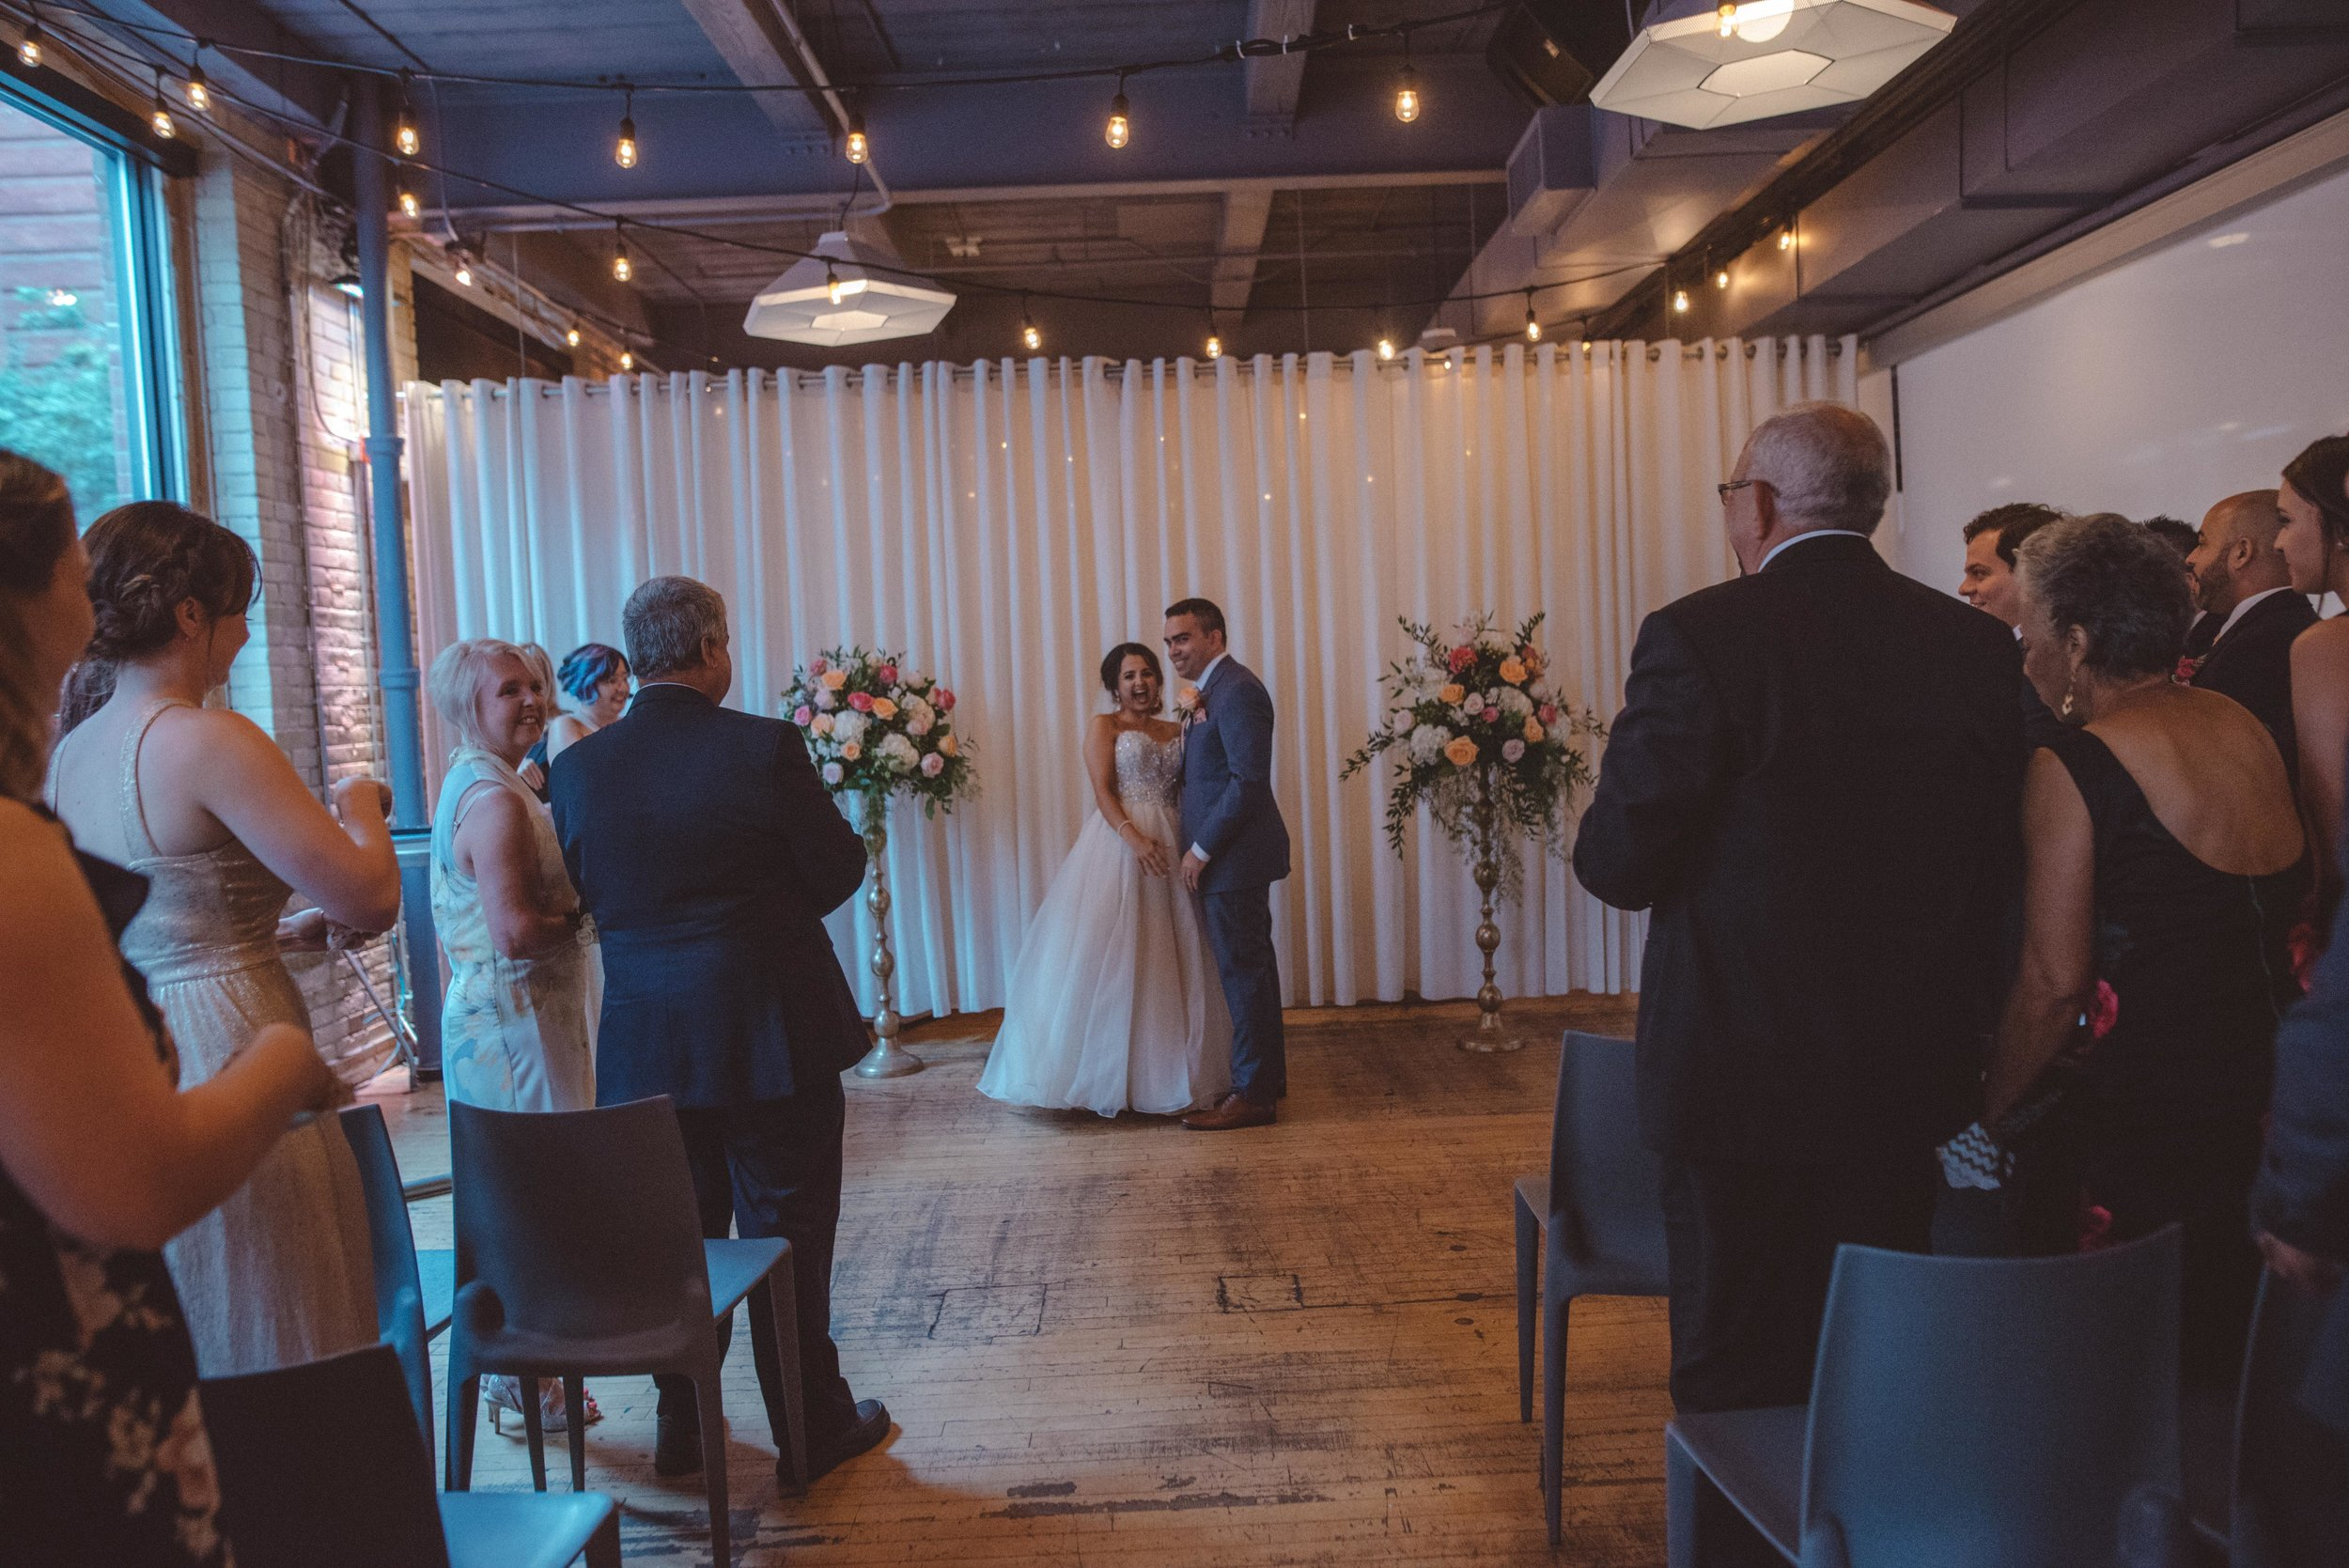 mariage_photographe_toronto_gatineau_ottawa_photographer_wedding-37.jpg